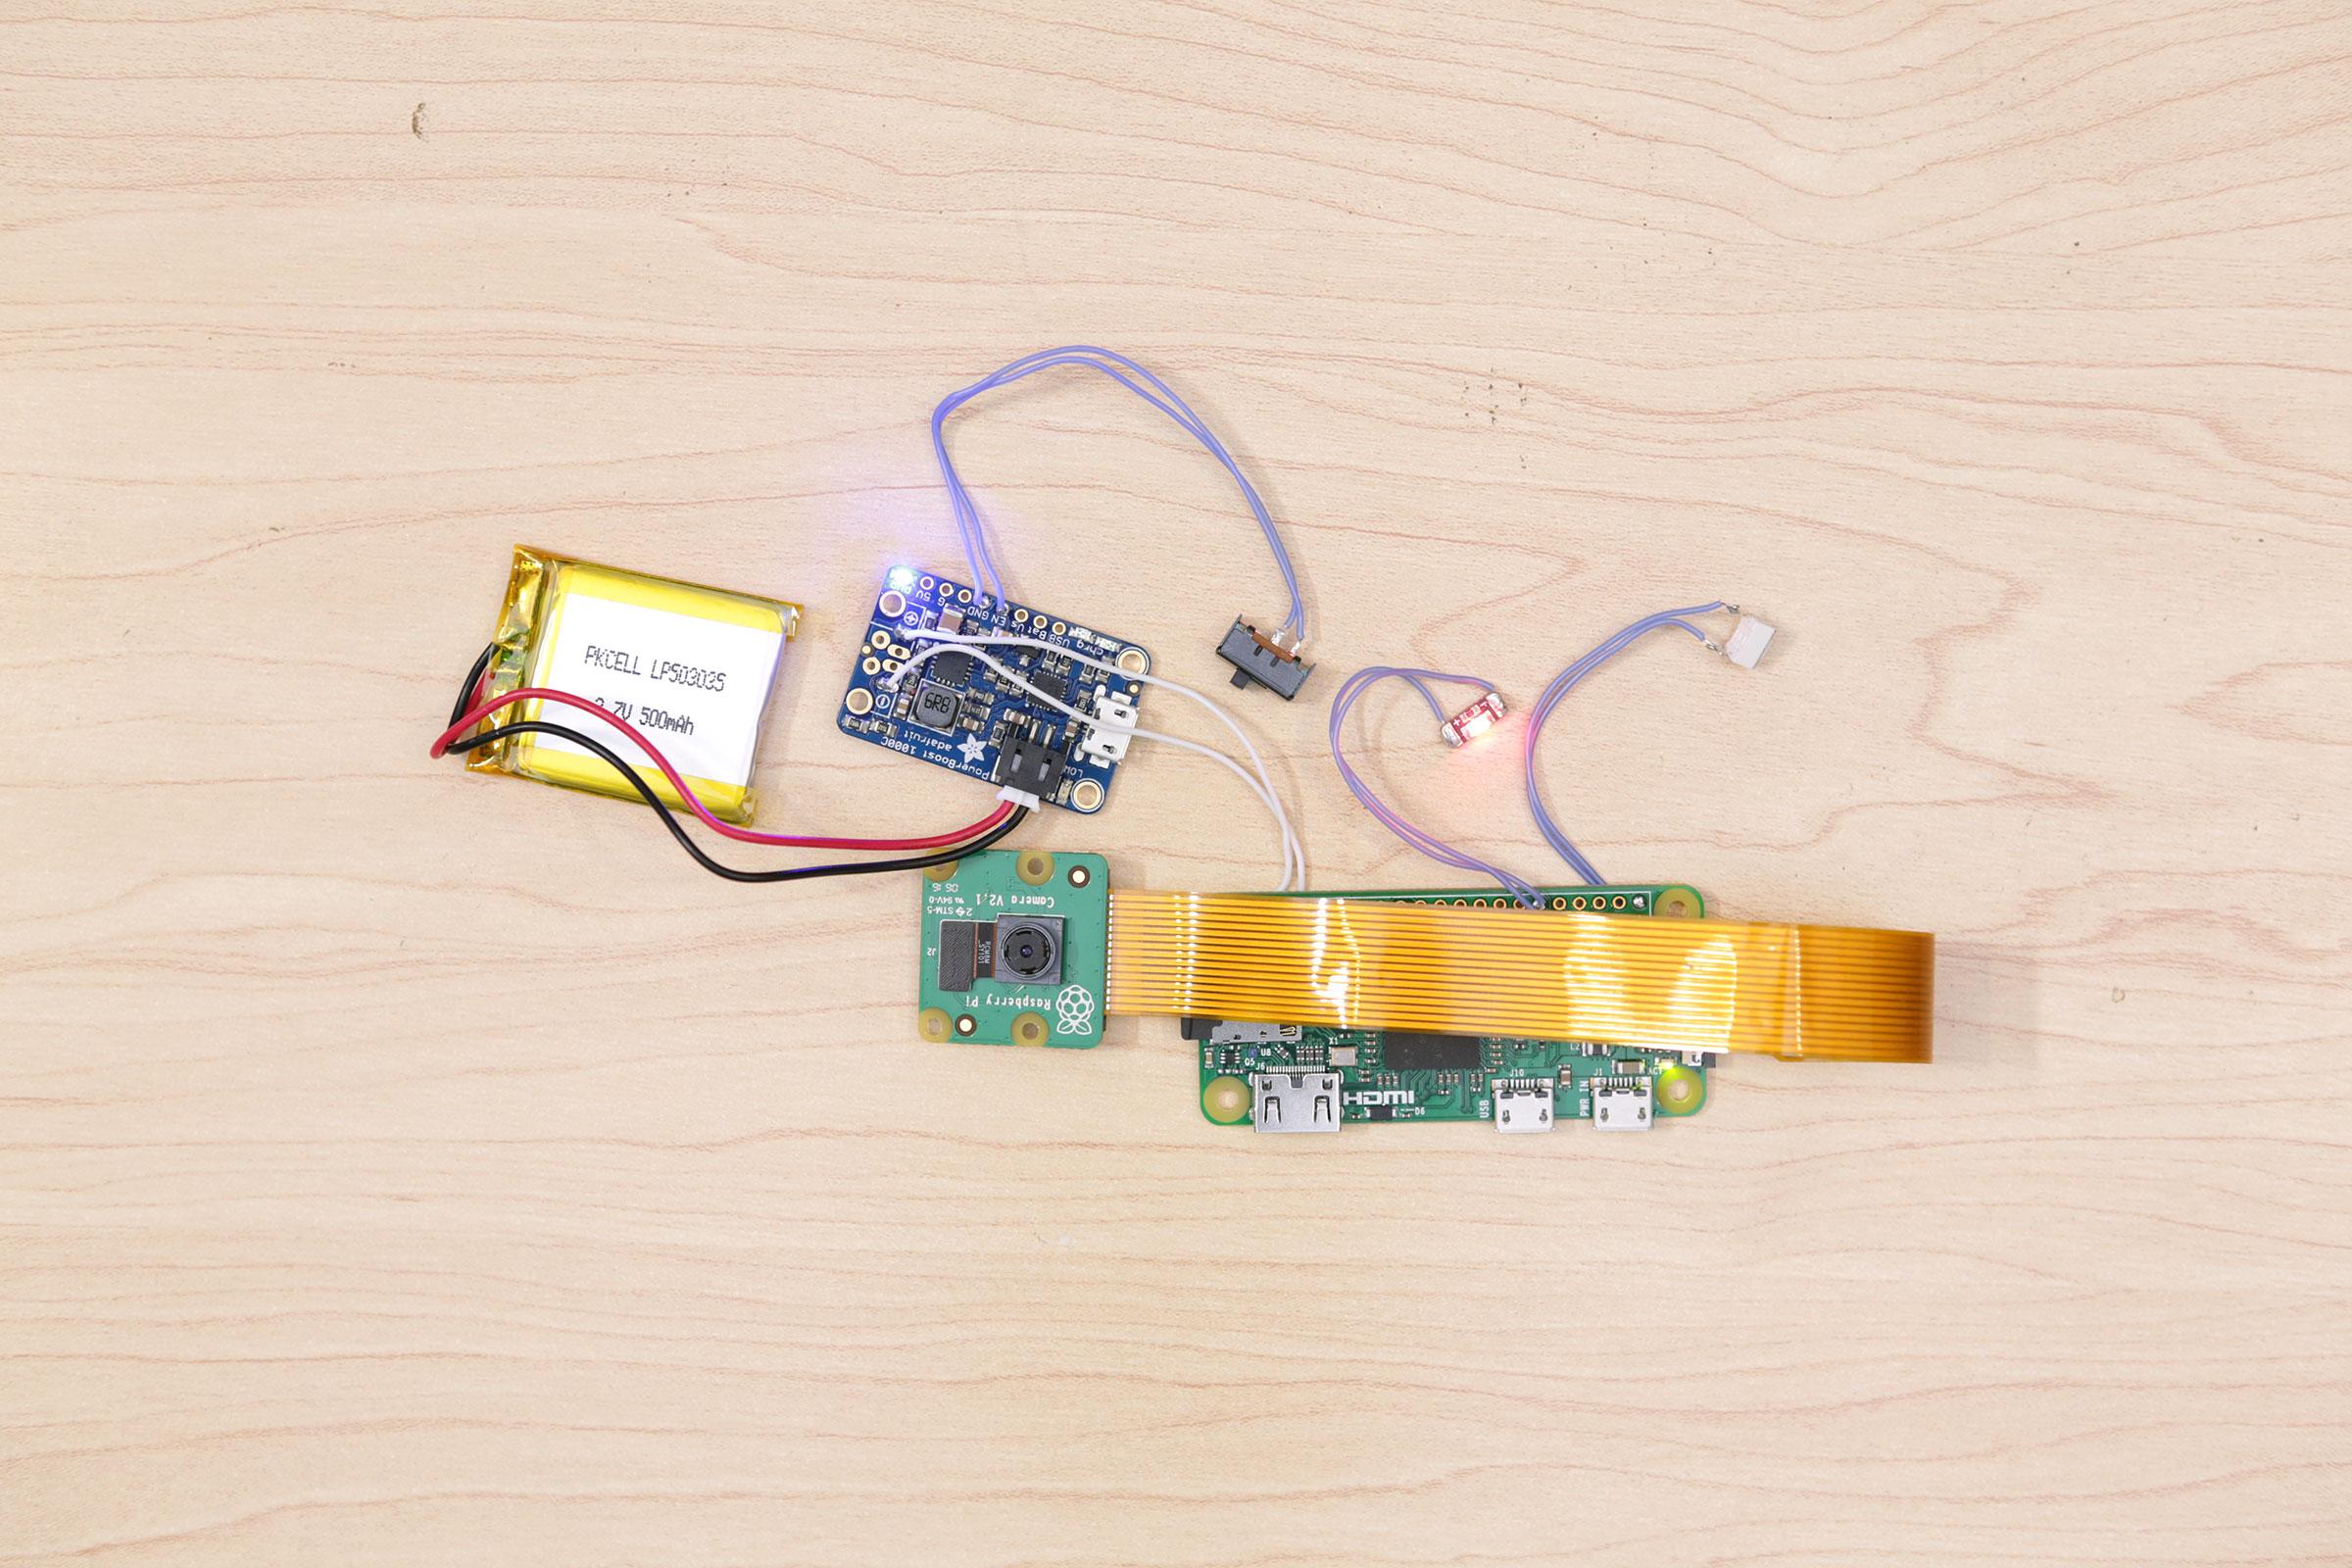 camera_test-circuit.jpg